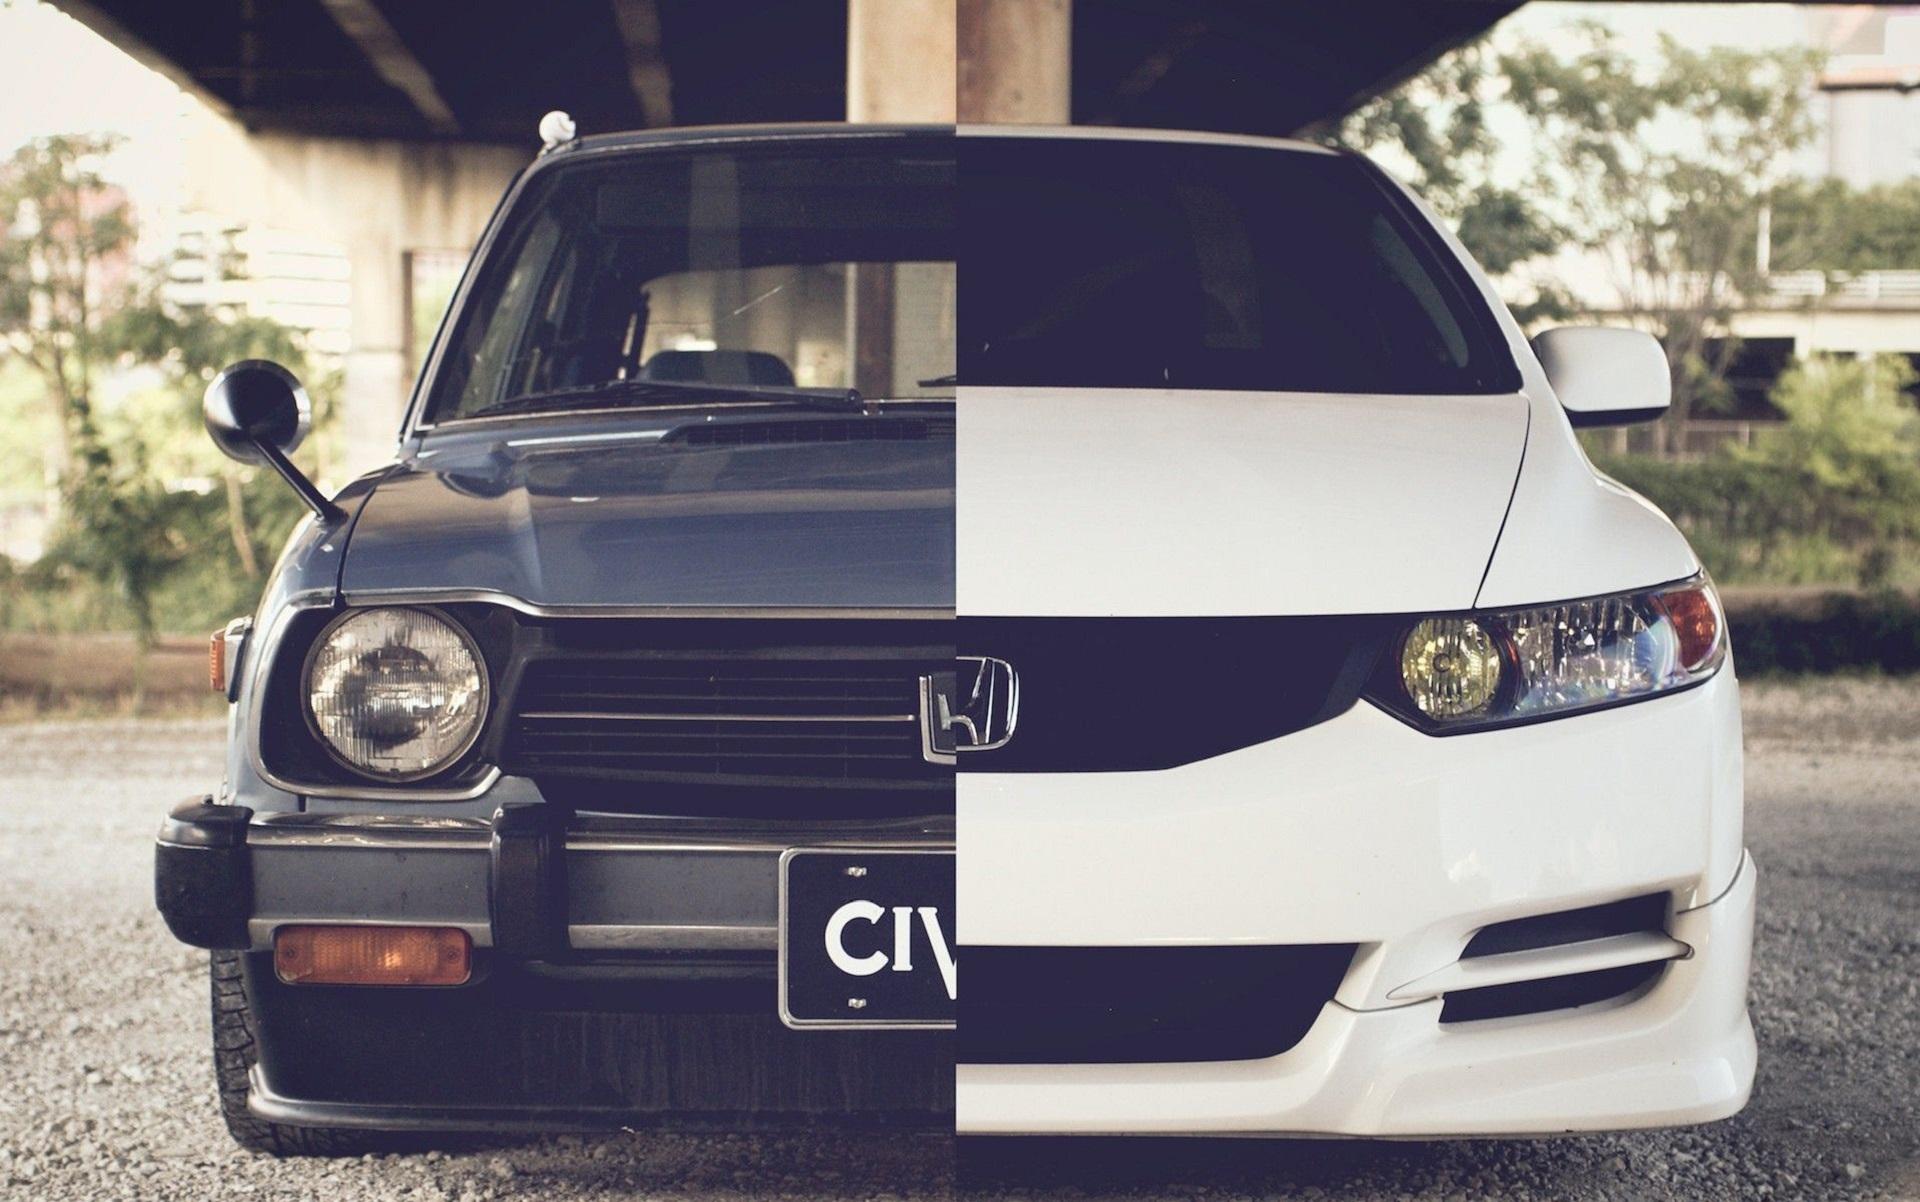 Honda Civic Hd Wallpaper